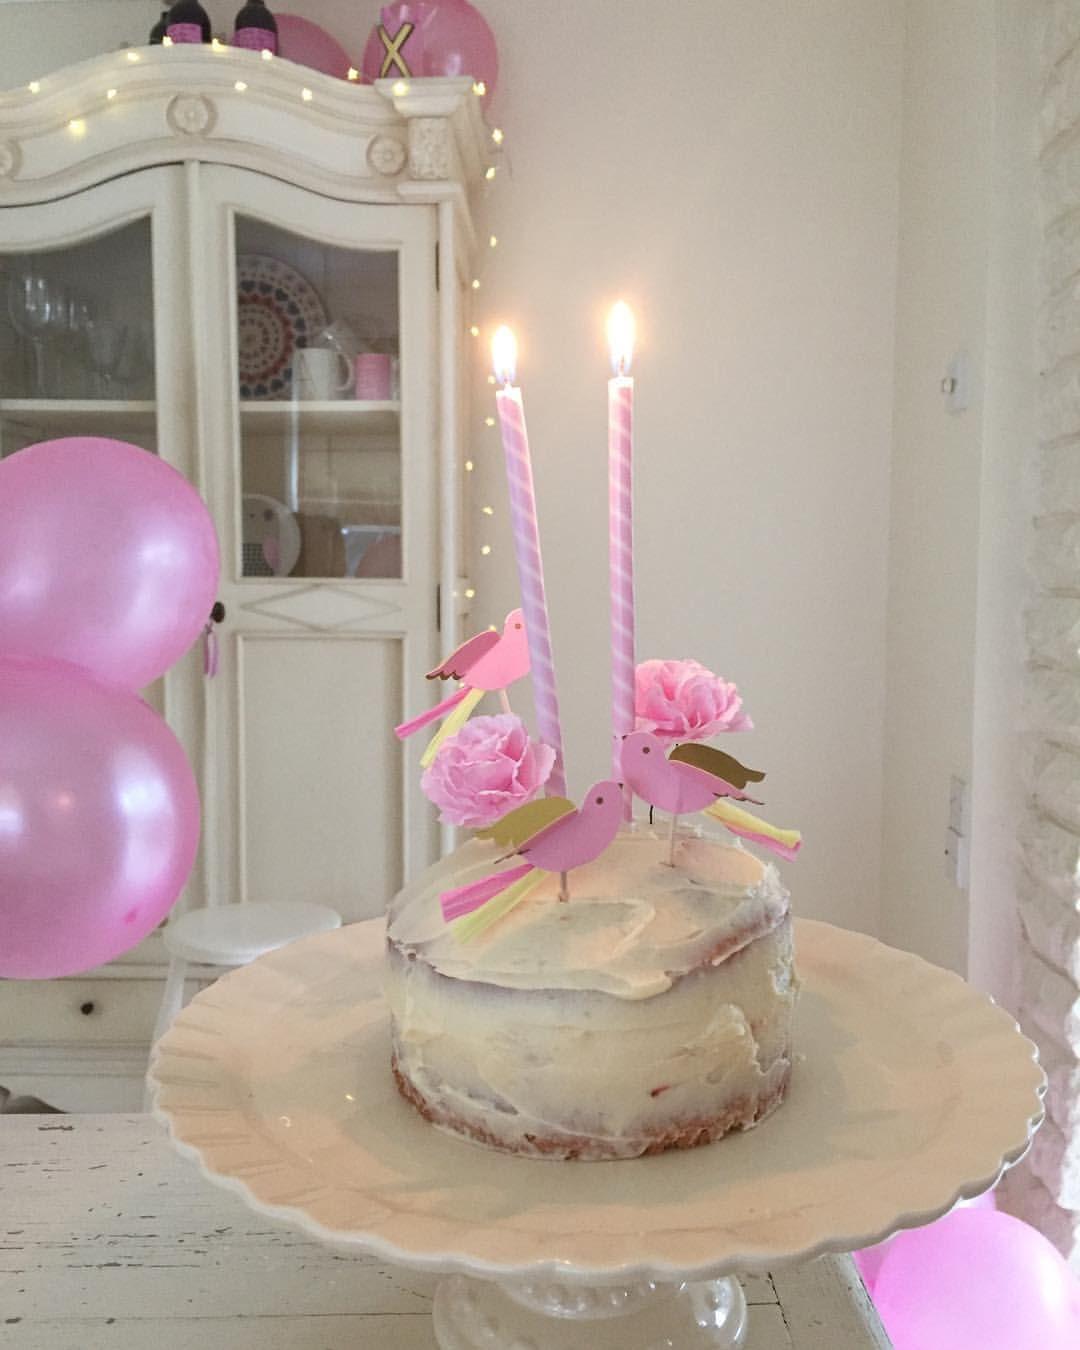 I M 48 Today Happy Birthday To Me Cake Birthday Birthdaycake Buttercreamcake Wednesday 24th 48 Mybirthday Inmyki Cake Themed Cakes Unique Cakes